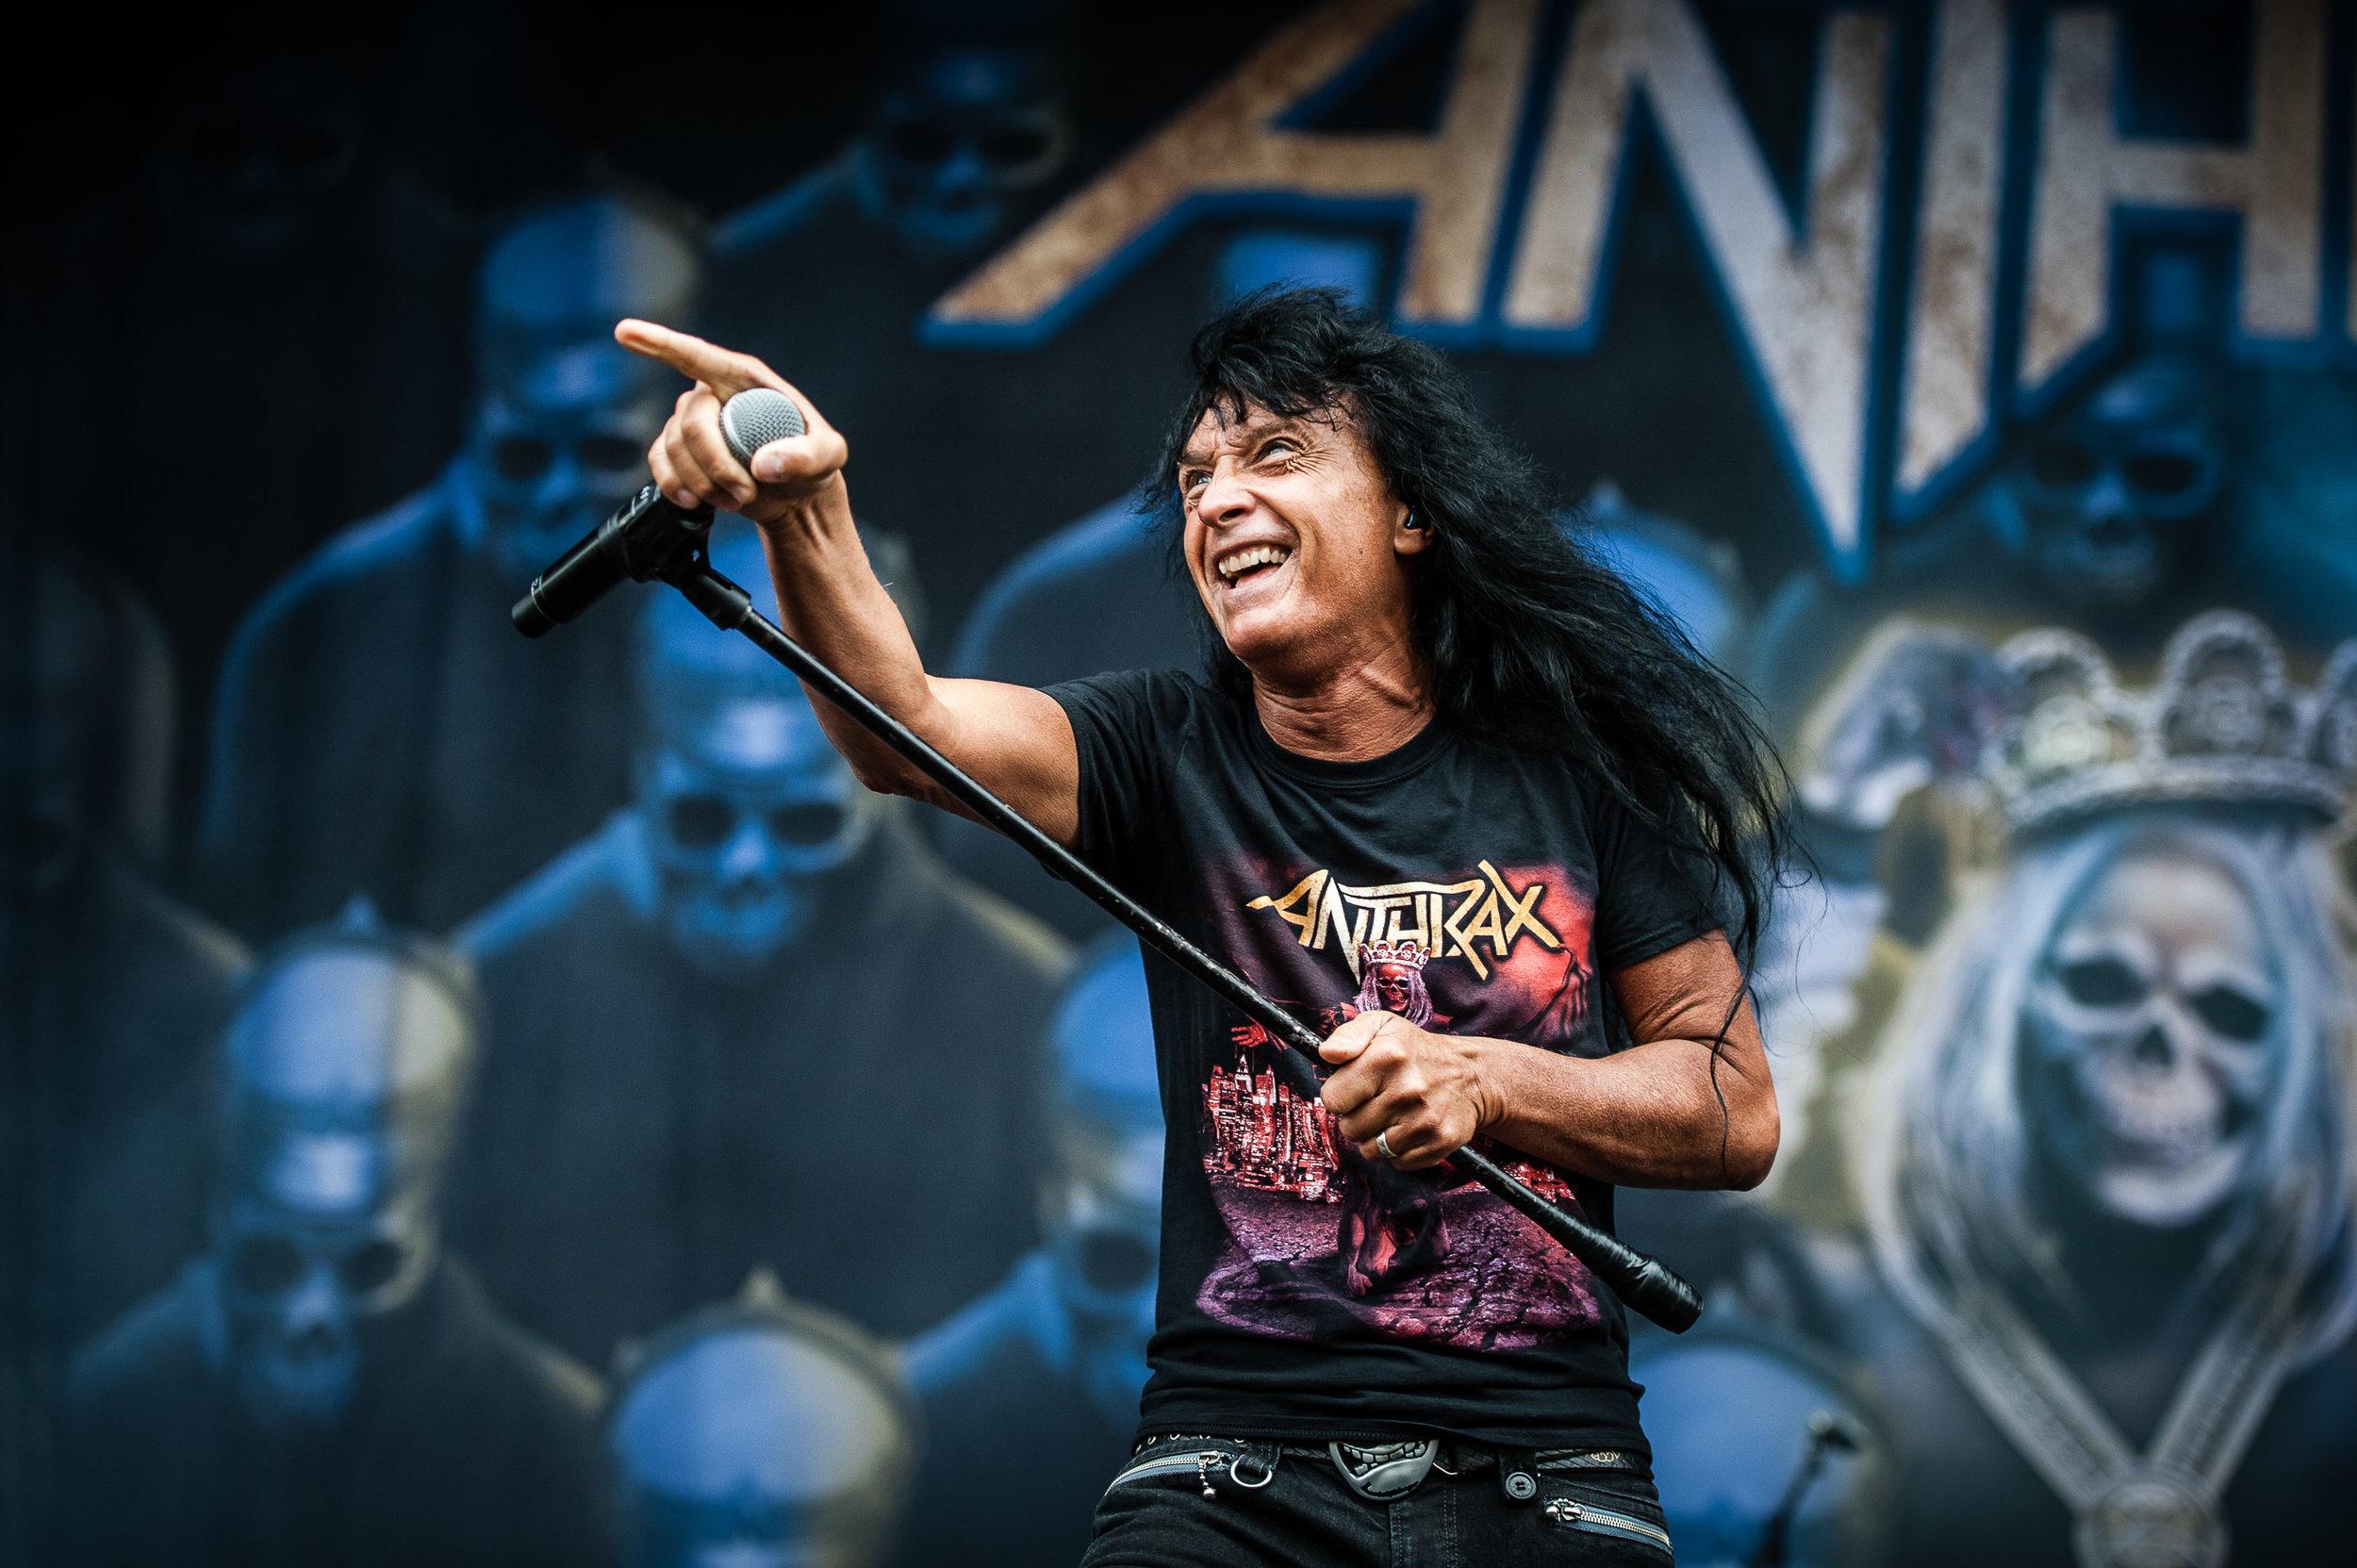 anthrax_download_sydney_13.jpg